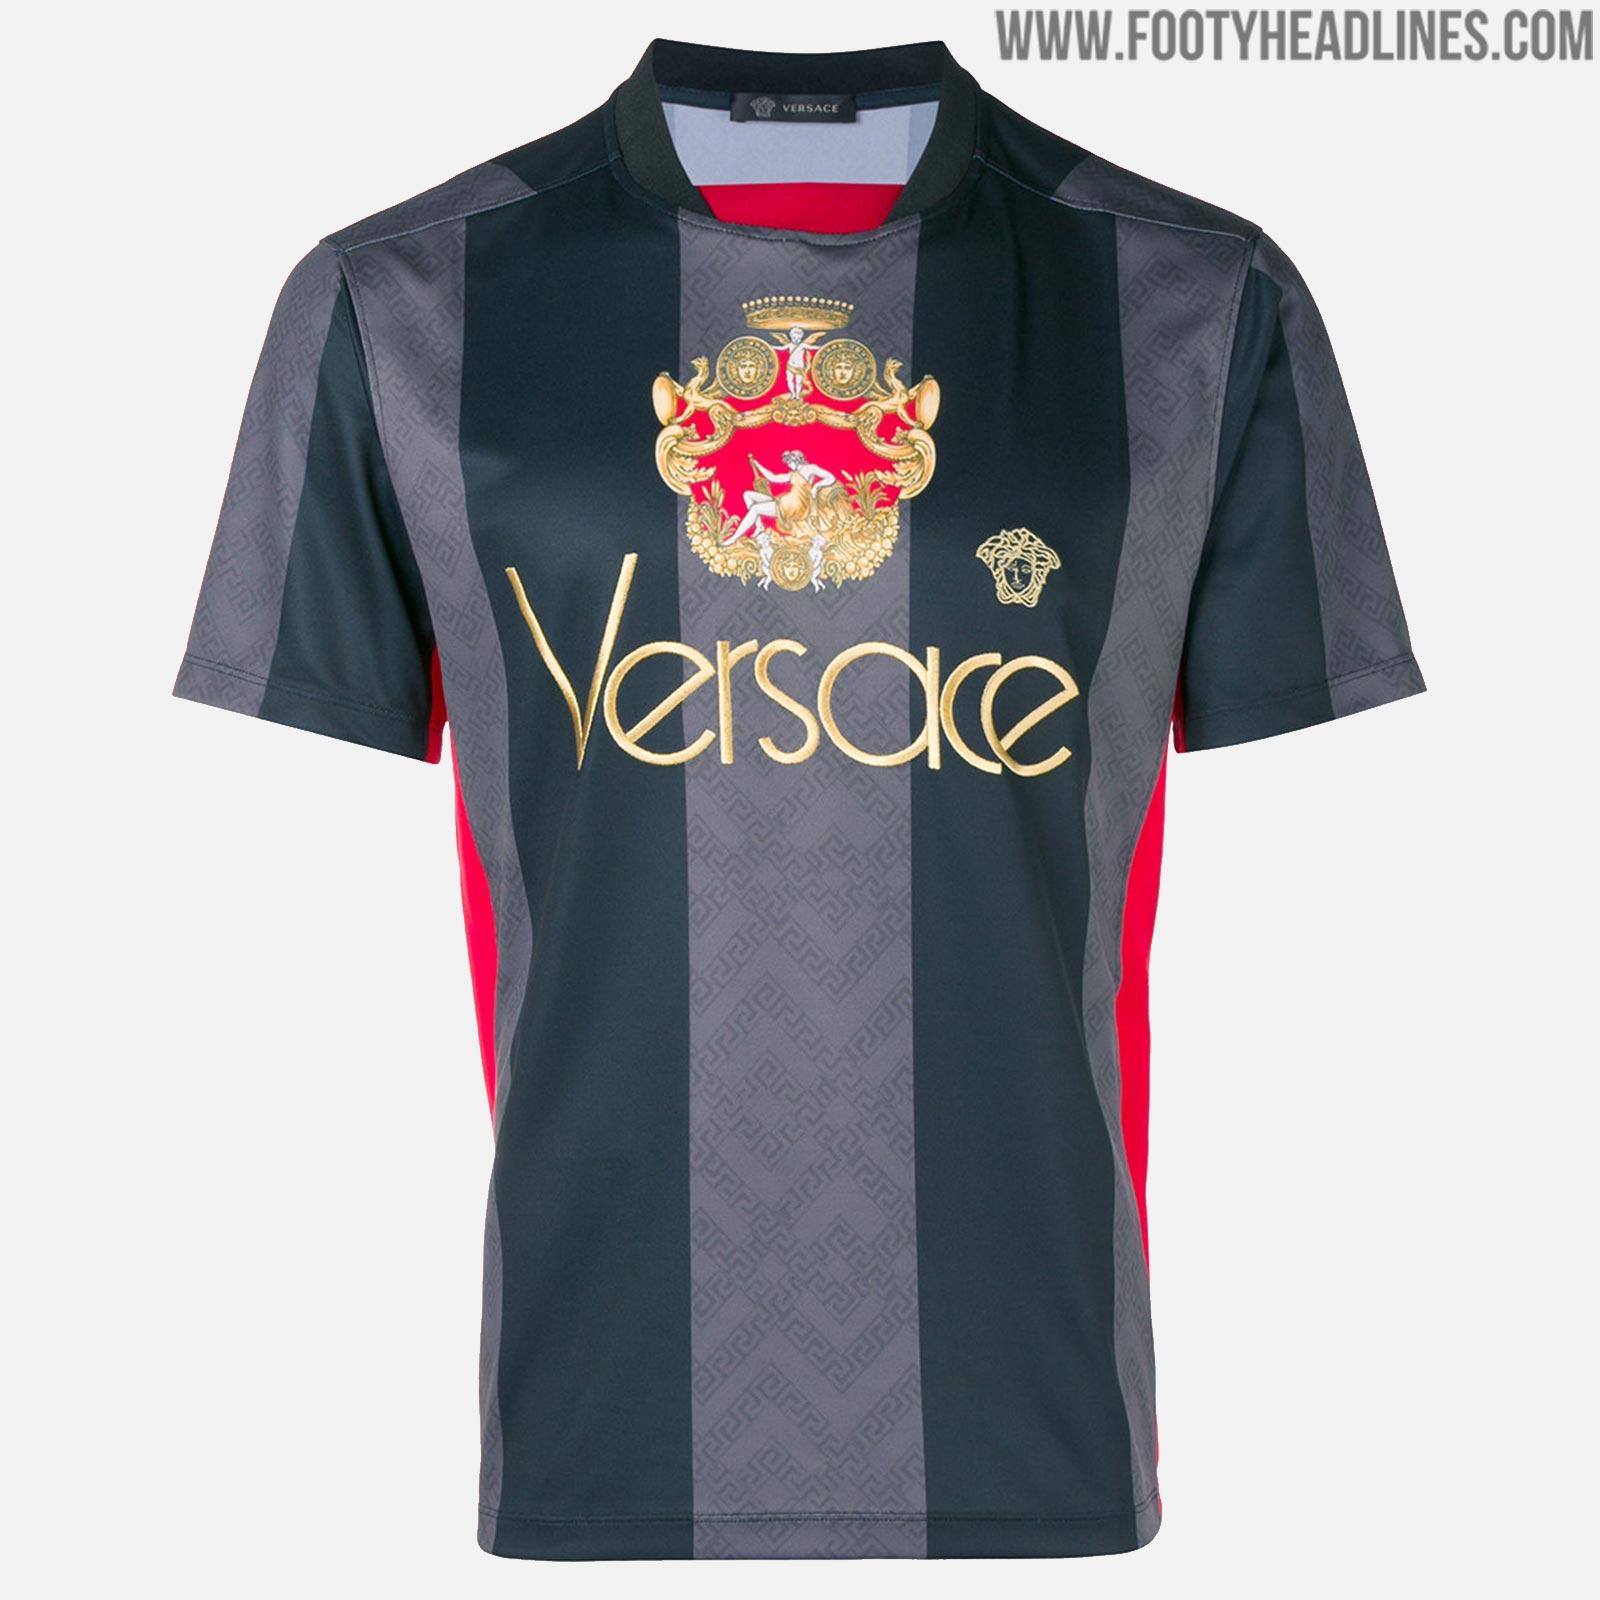 824 USD - Second Versace Football Kit Released - Footy Headlines c401dccc3